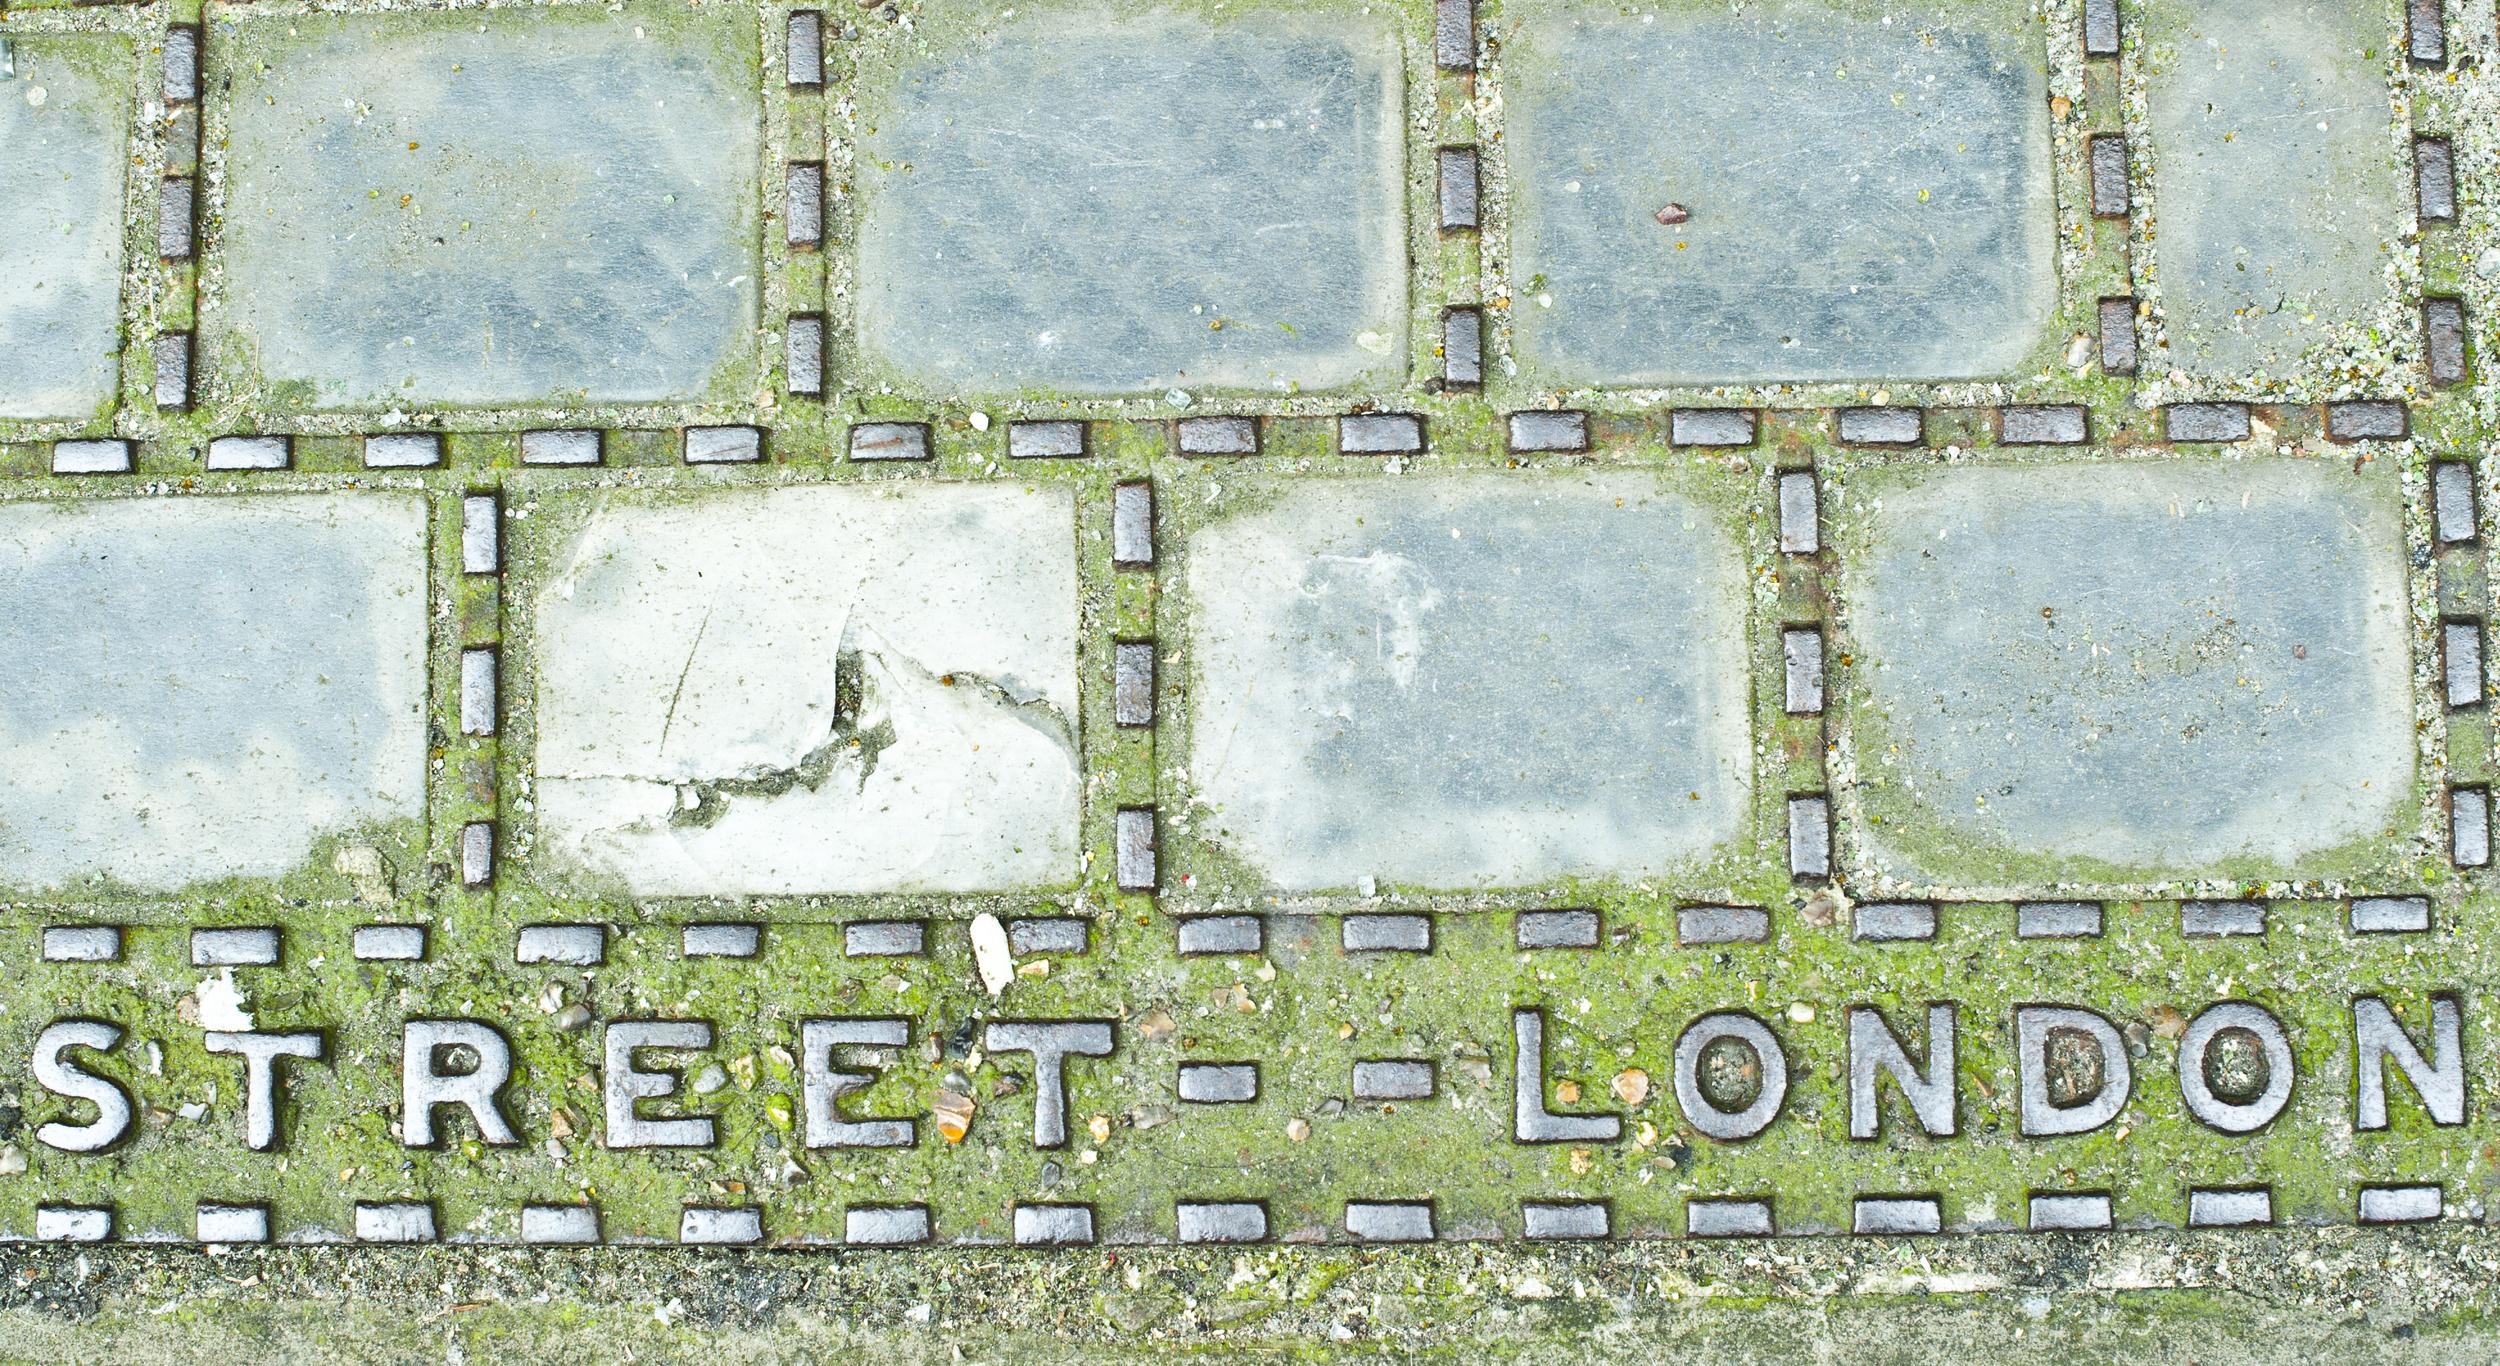 Street london 1 copy.jpg